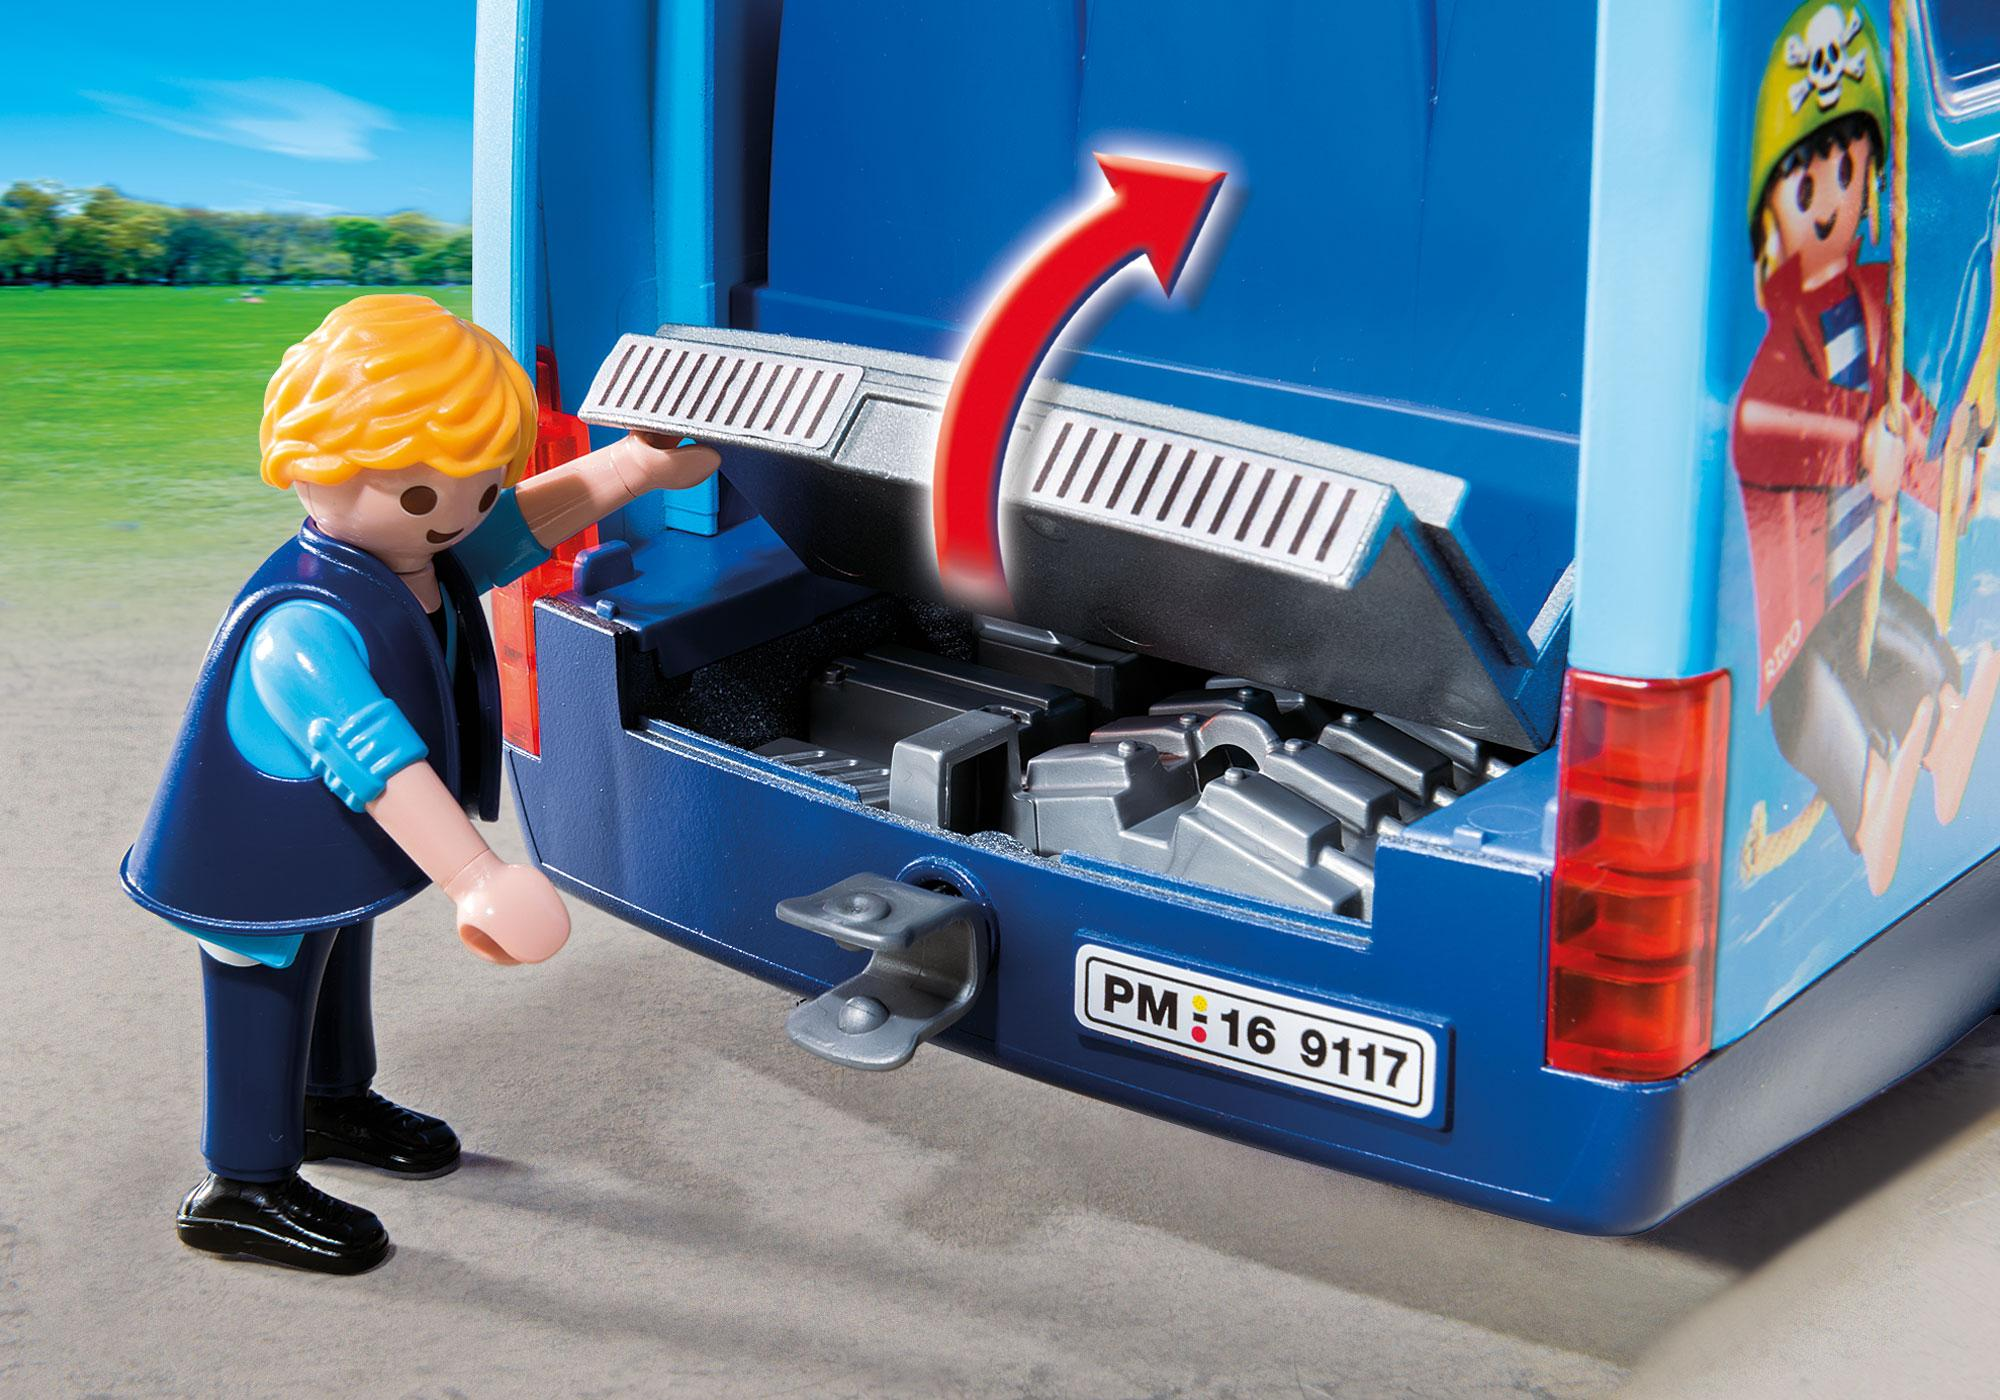 http://media.playmobil.com/i/playmobil/9117_product_extra4